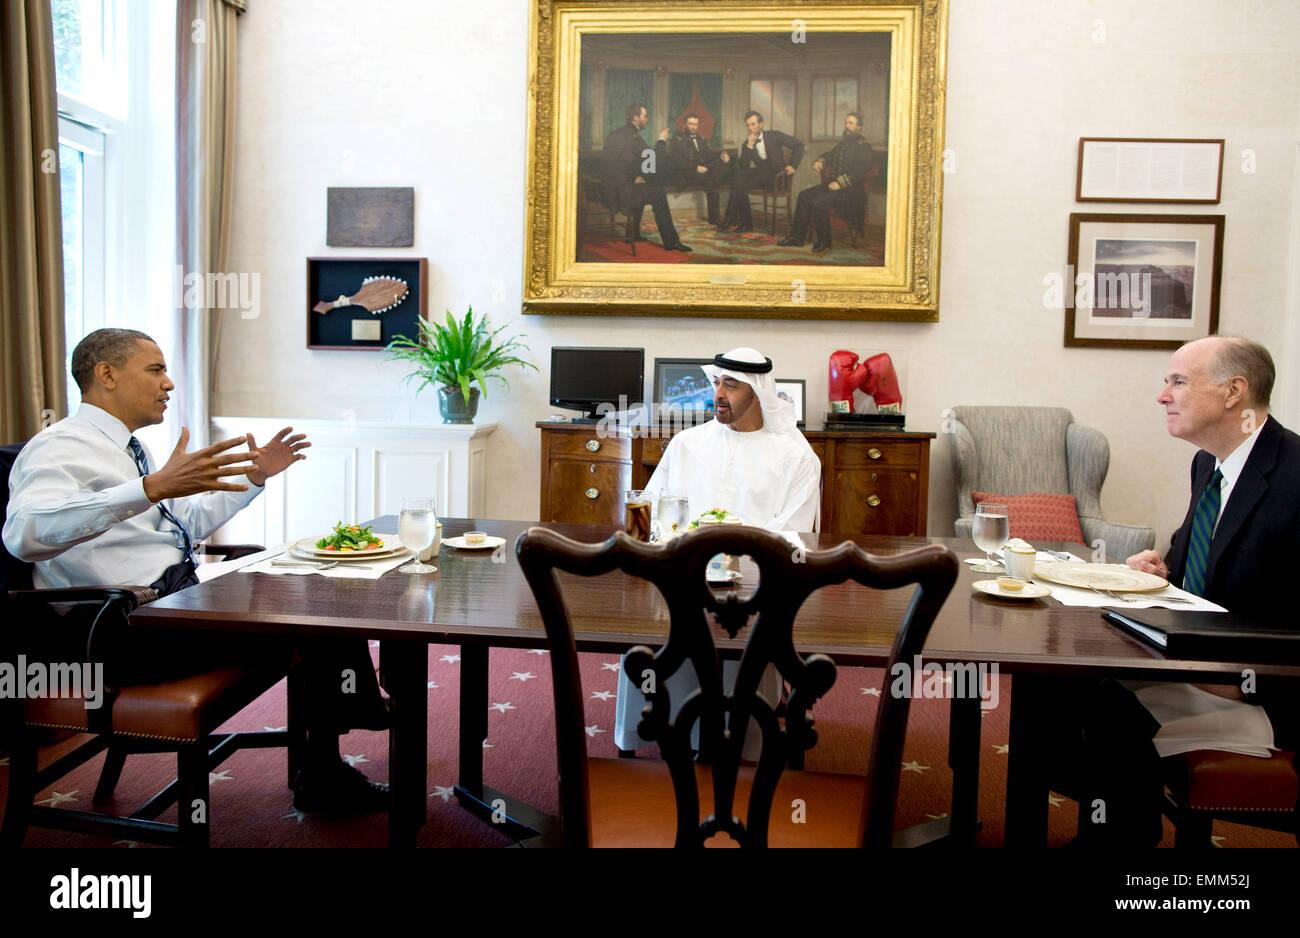 27.JUNE.2012. WASHINGTON D.C.  PRESIDENT BARACK OBAMA HAS LUNCH WITH ABU DHABI CROWN PRINCE MOHAMMED BIN ZAYED AL - Stock Image